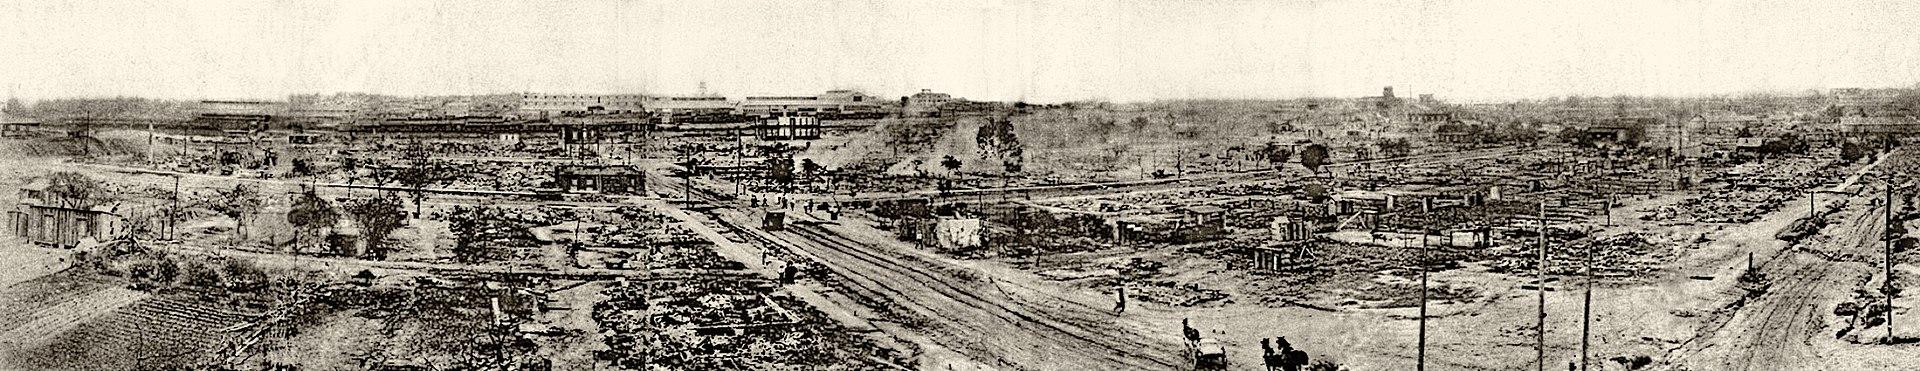 1920px-Panorama_of_the_ruined_area_tulsa